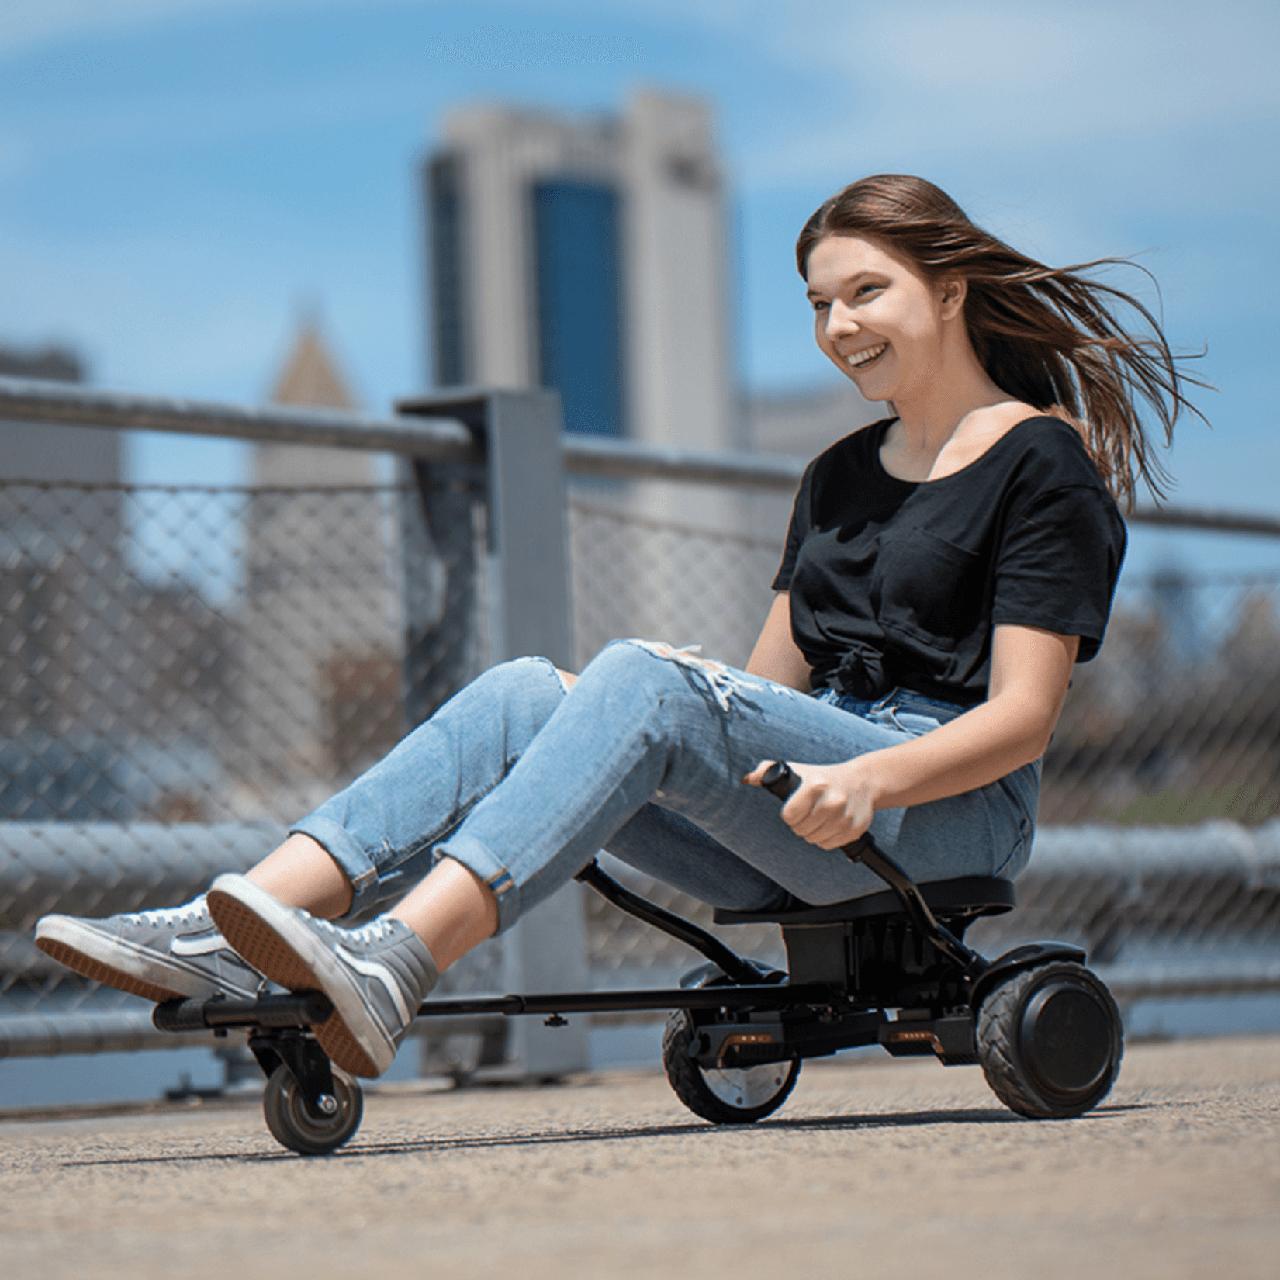 JetKart Phantom Electric Go-Kart